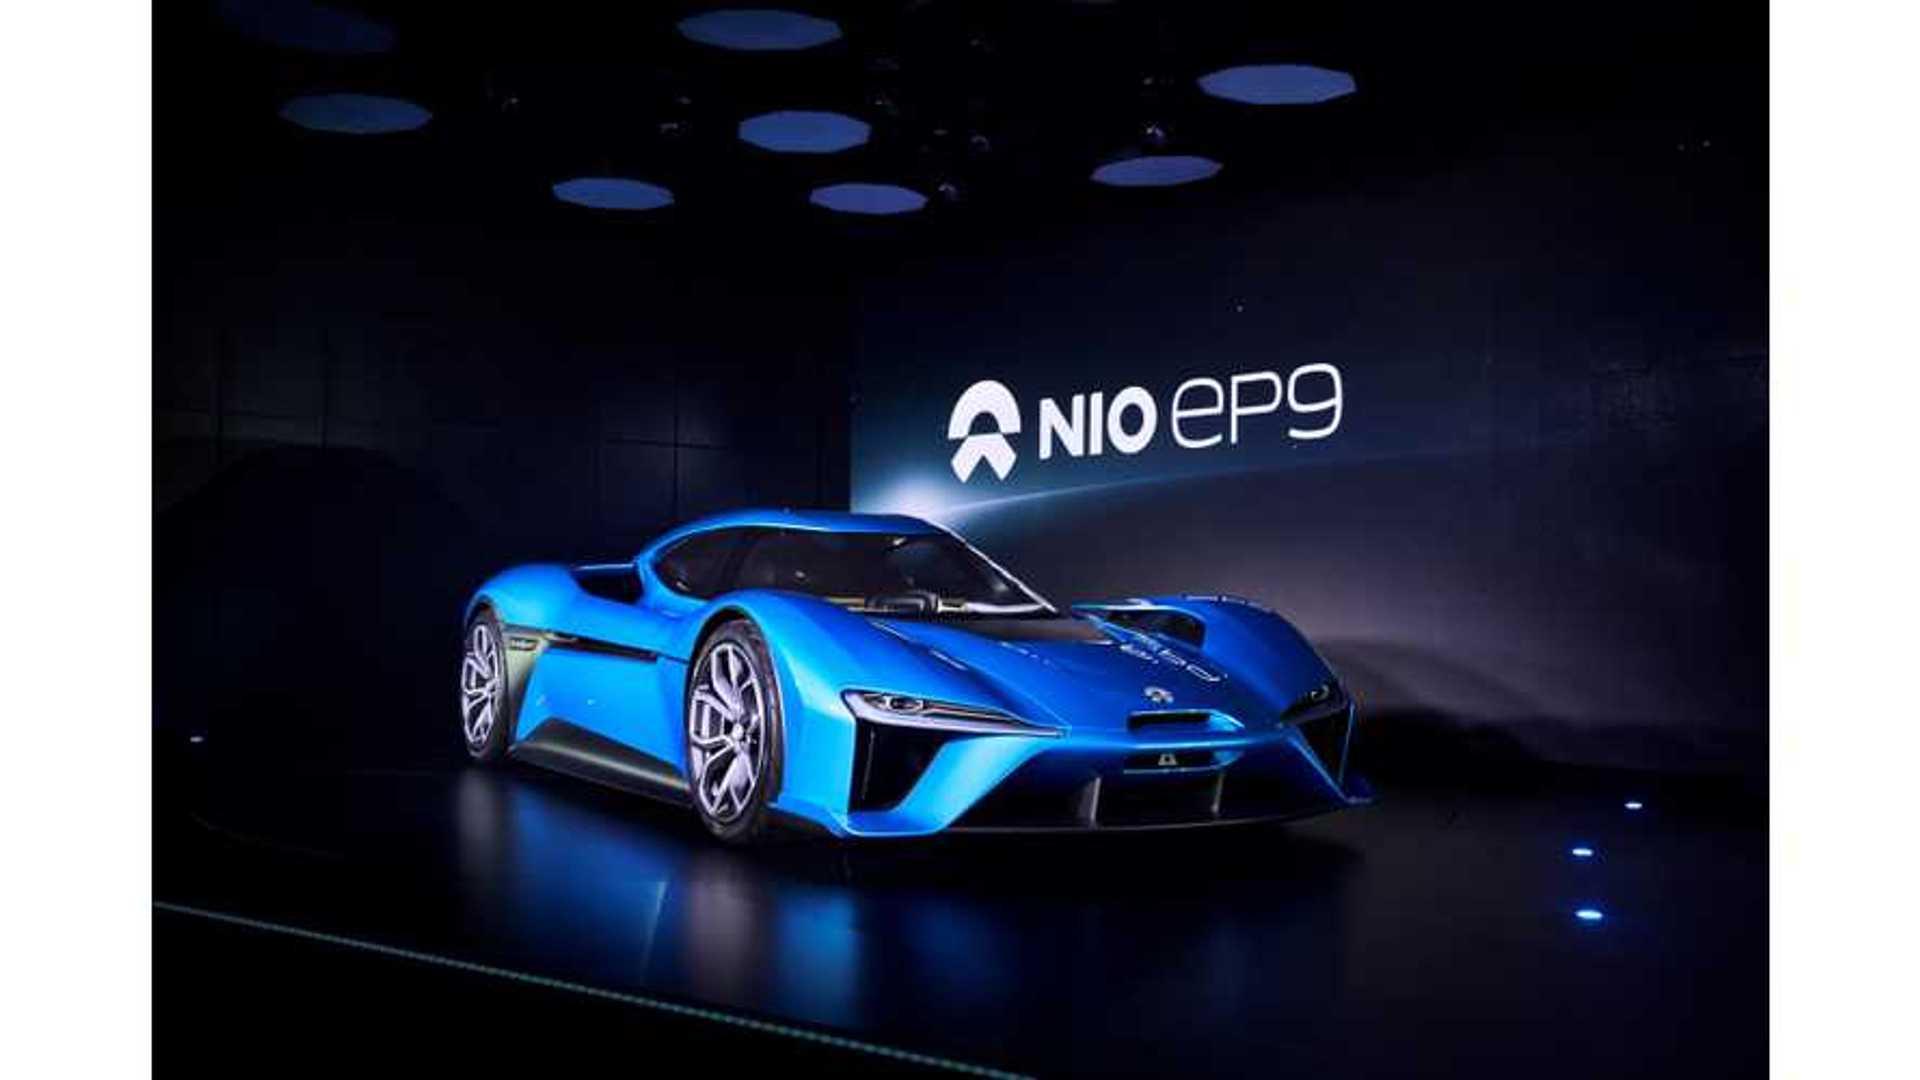 Nextev Launches Nio Brand And World S Fastest Ev 0 124 Mph In 7 1 Seconds 194 Top Sd Videos